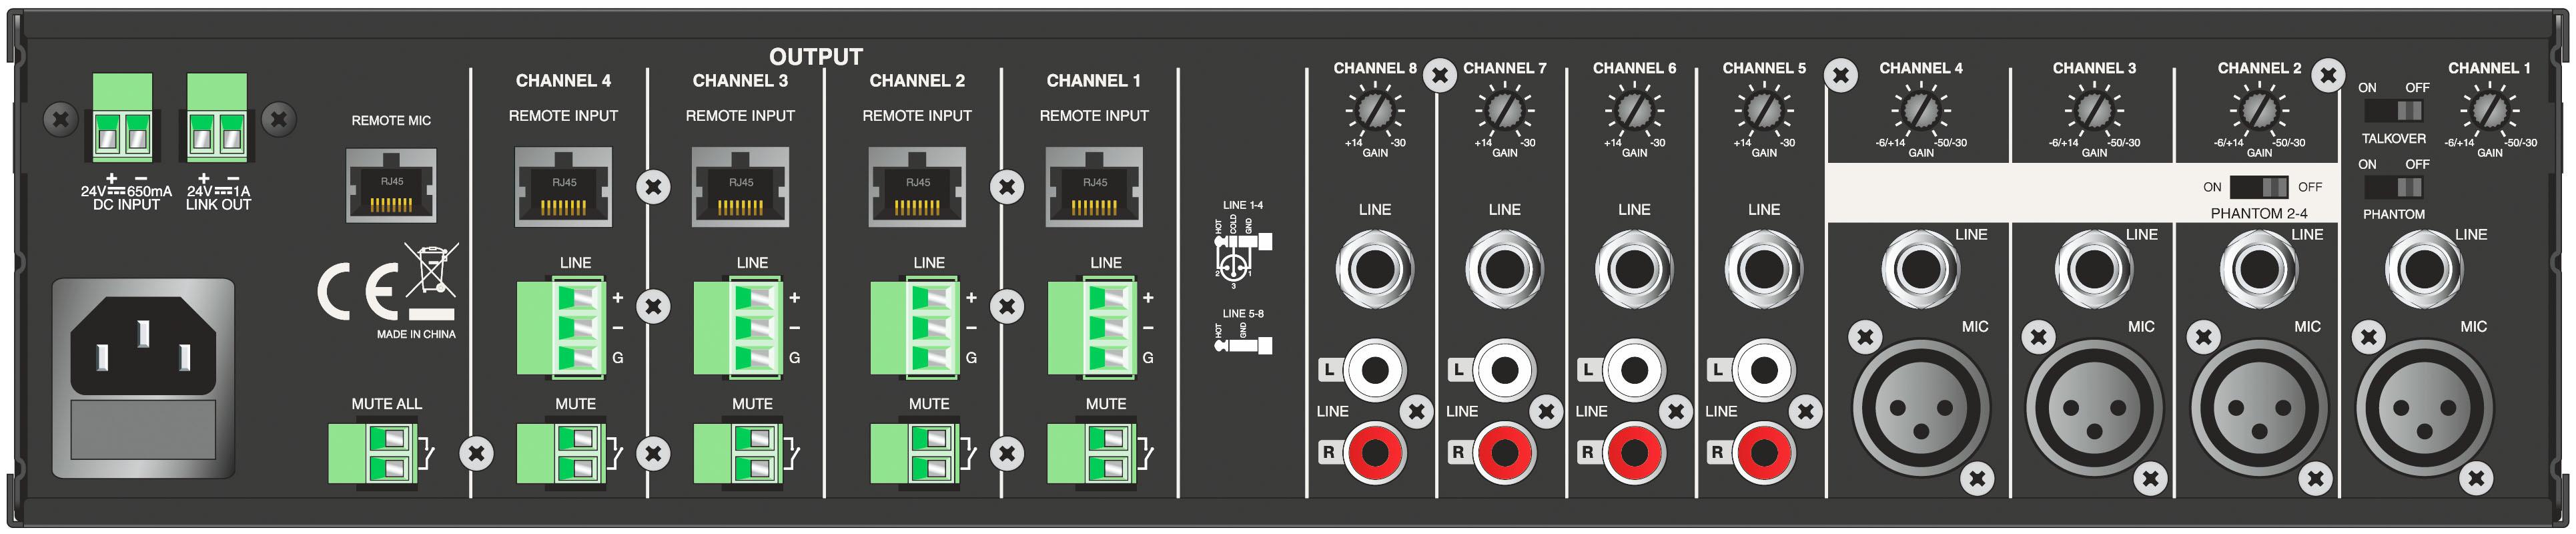 DPA QMX - نمای پشت میکسر و پری آمپ ( دی پی ای ) دارای 8 کانال ورودی و خروجی های متفاوت